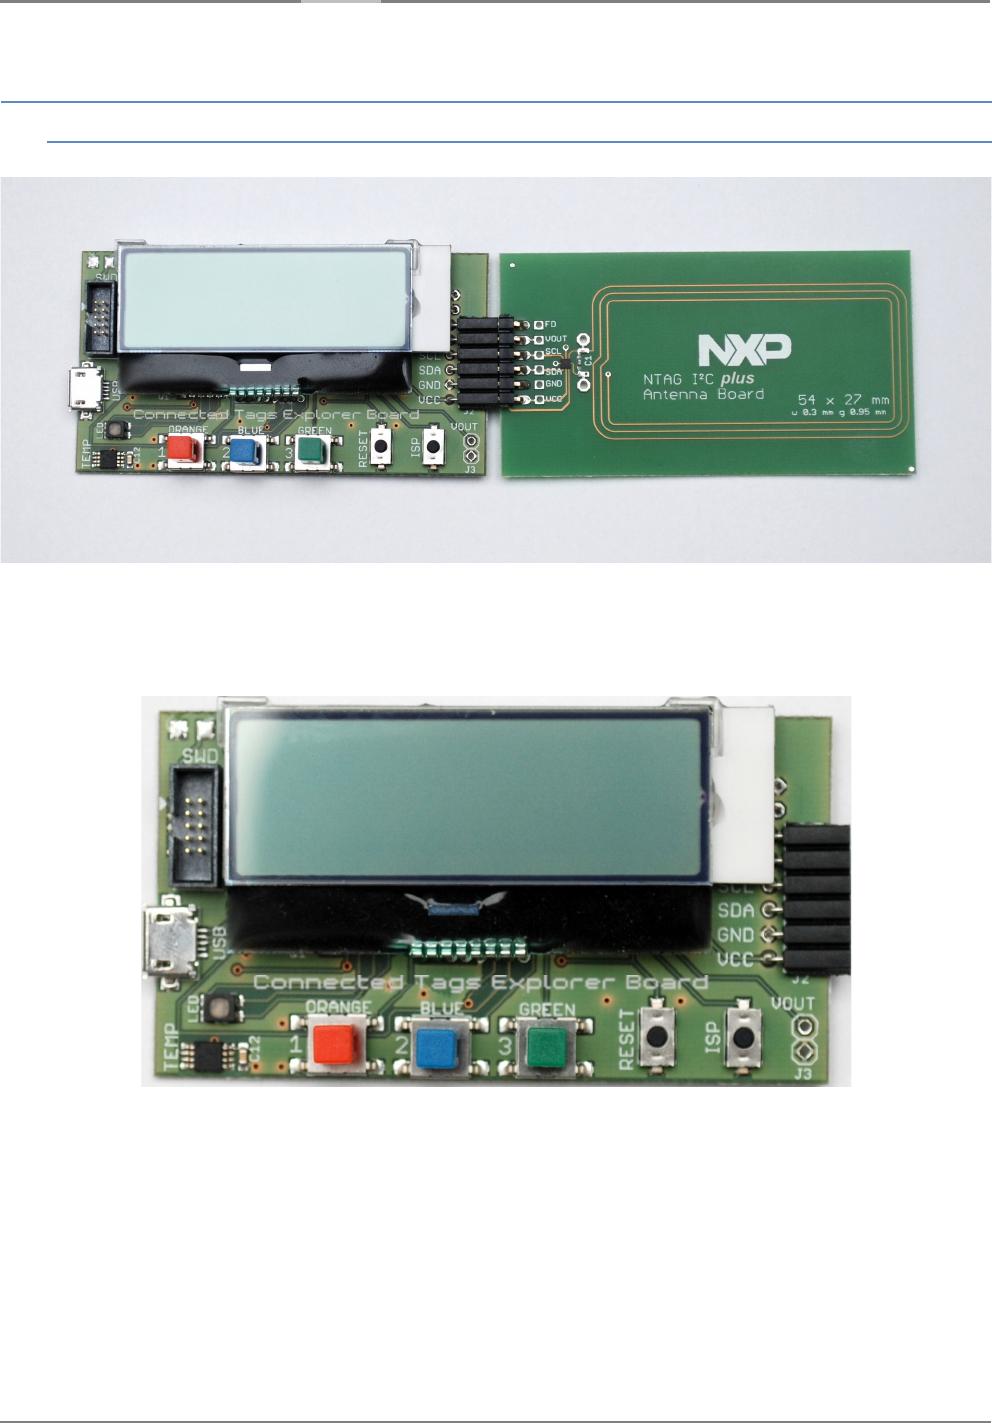 NXP Austria OM5569-NT322E NTAG I2C plus Explorer Kit User